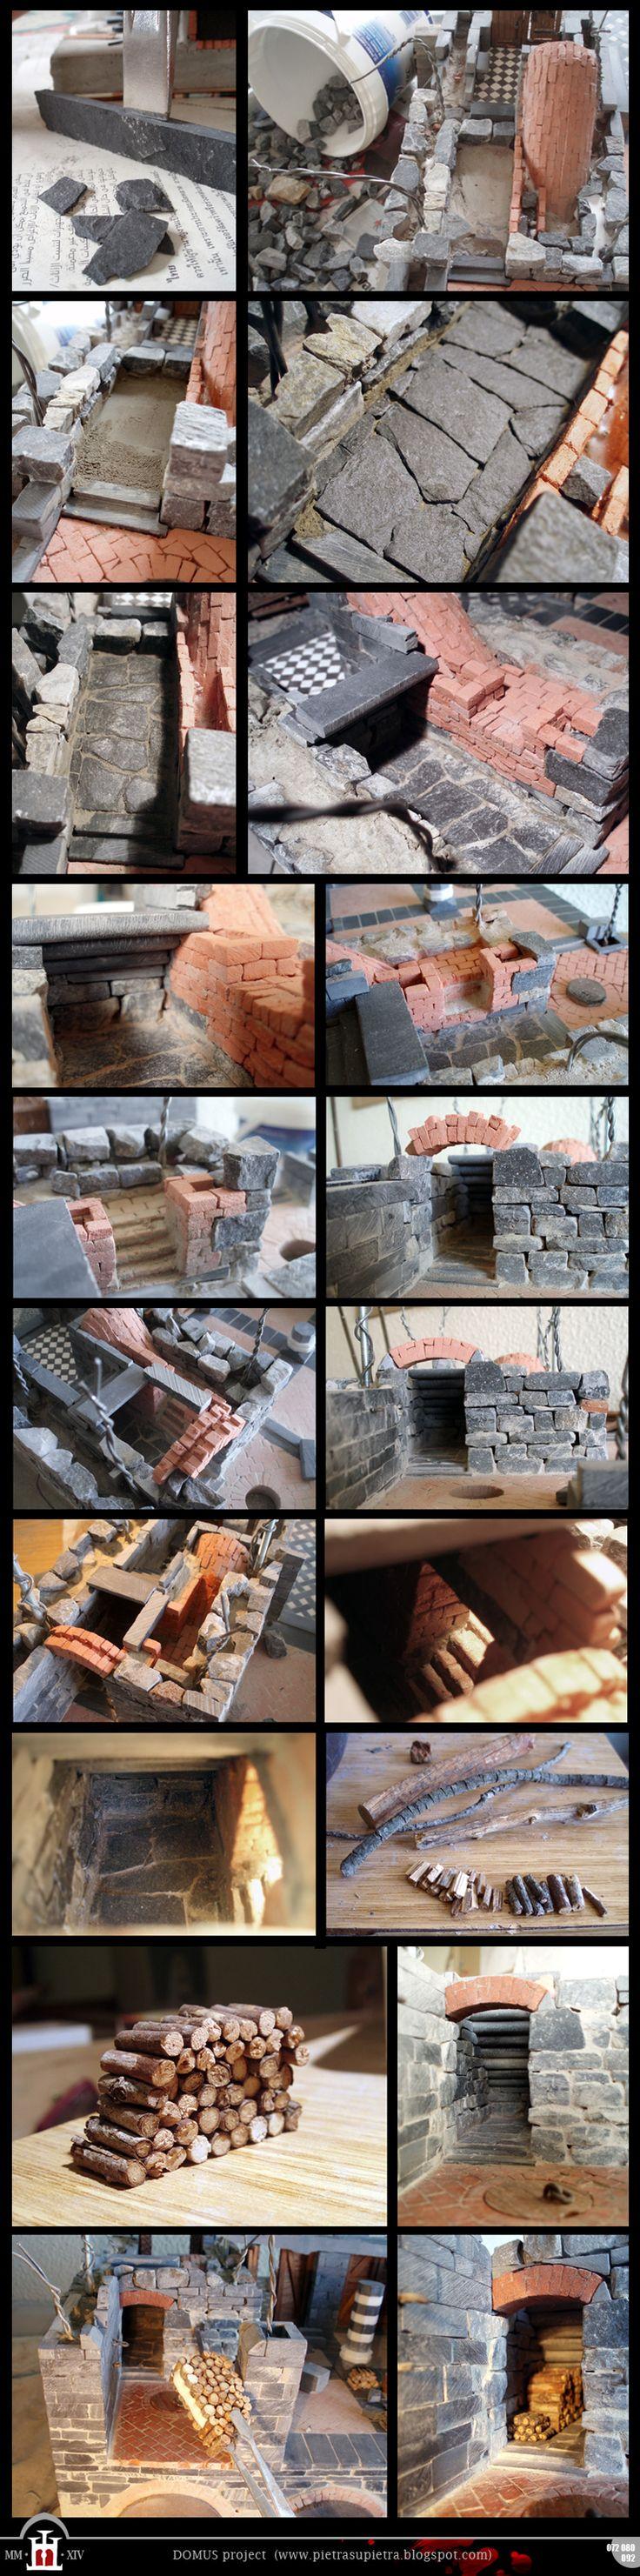 Domus project 72-80-92 - Under-stair firewood storage  http://pietrasupietra.blogspot.com/2011/07/costruzione-72-il-sottoscala-1.html http://pietrasupietra.blogspot.com/2011/09/costruzione-80-il-sottoscala-2.html http://pietrasupietra.blogspot.com/2011/11/costruzione-92-il-sottoscala-3-la.html